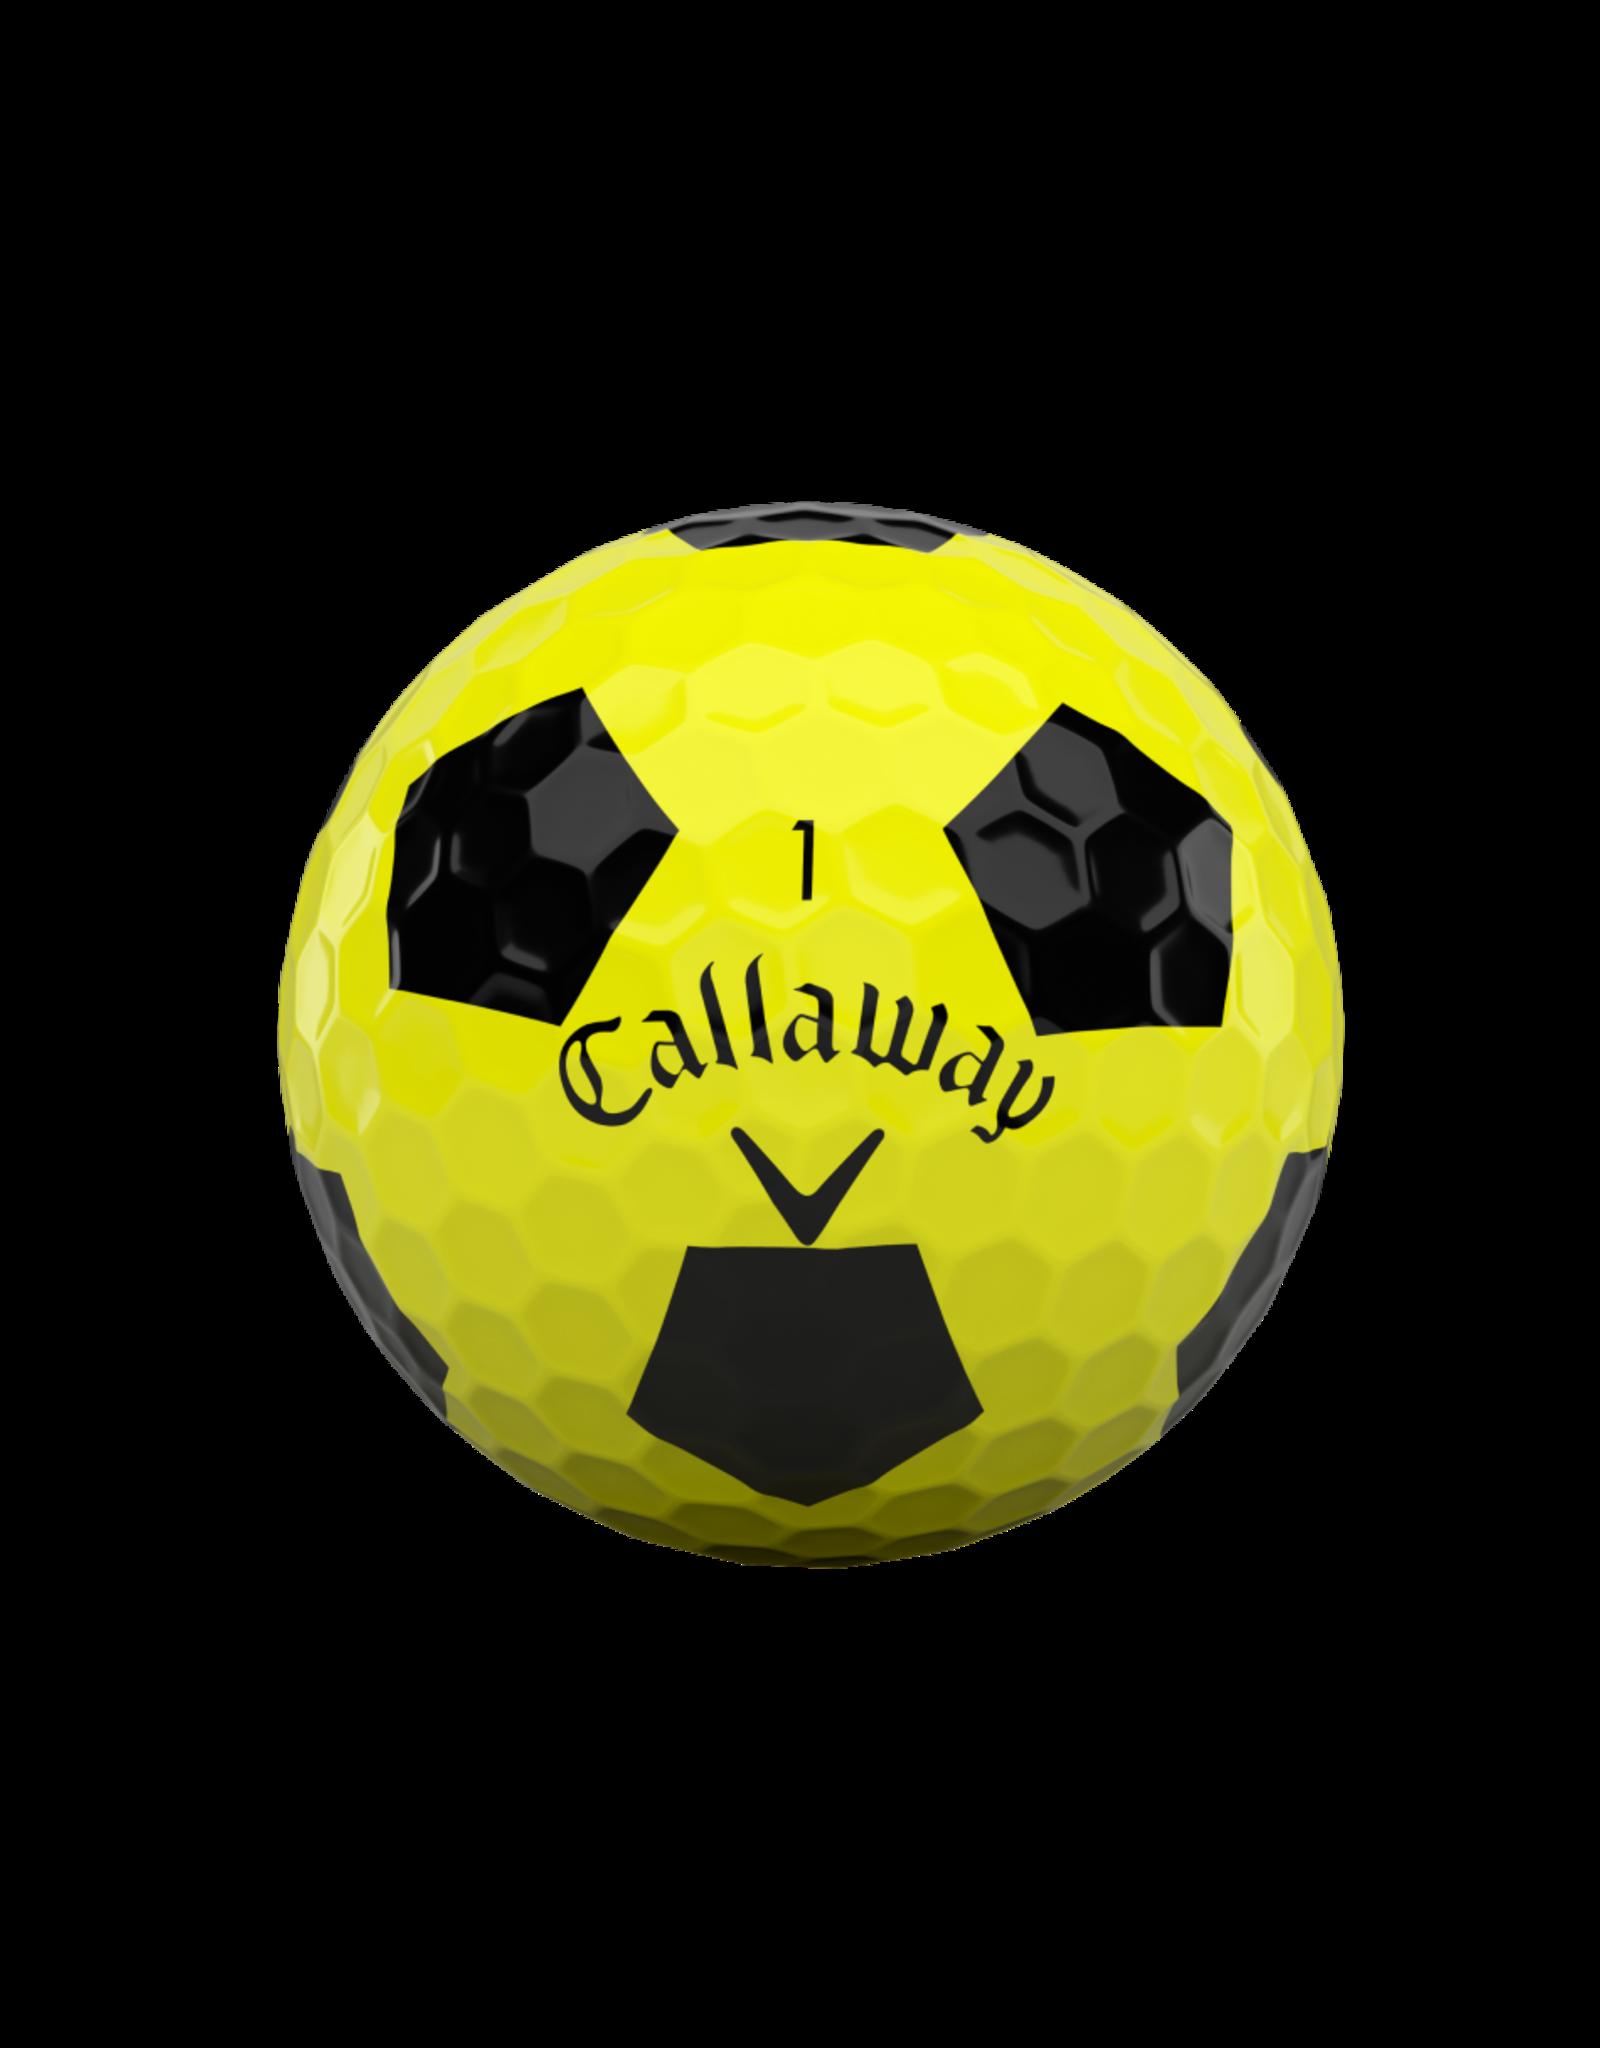 CALLAWAY CALLAWAY CHROME SOFT 2021 12PK